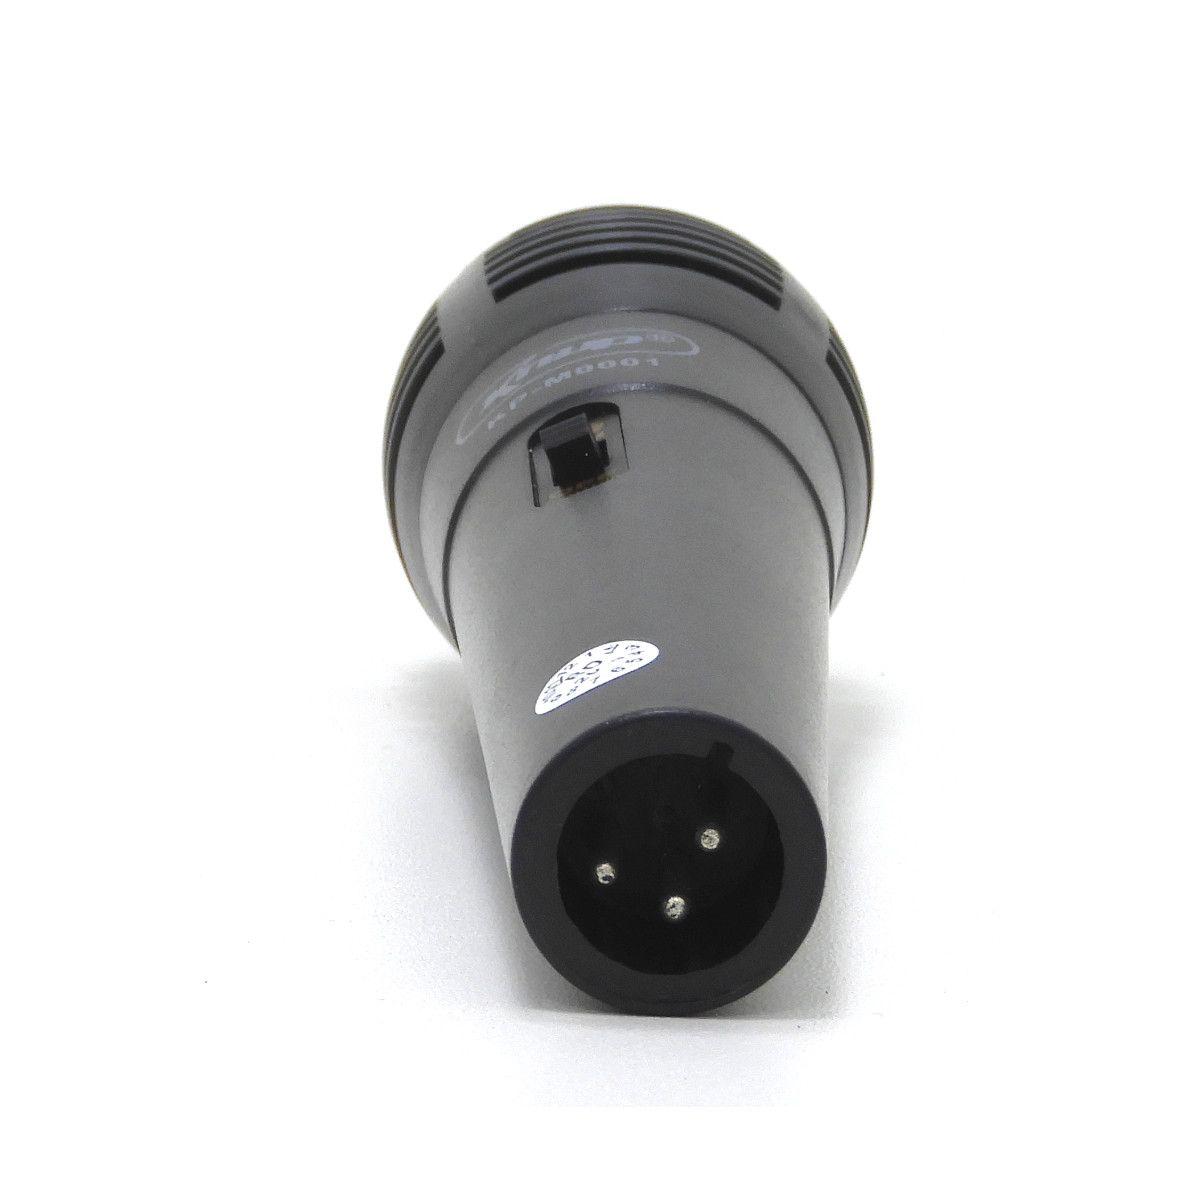 Microfone Com fio 1m P10 Knup Kp-m0001